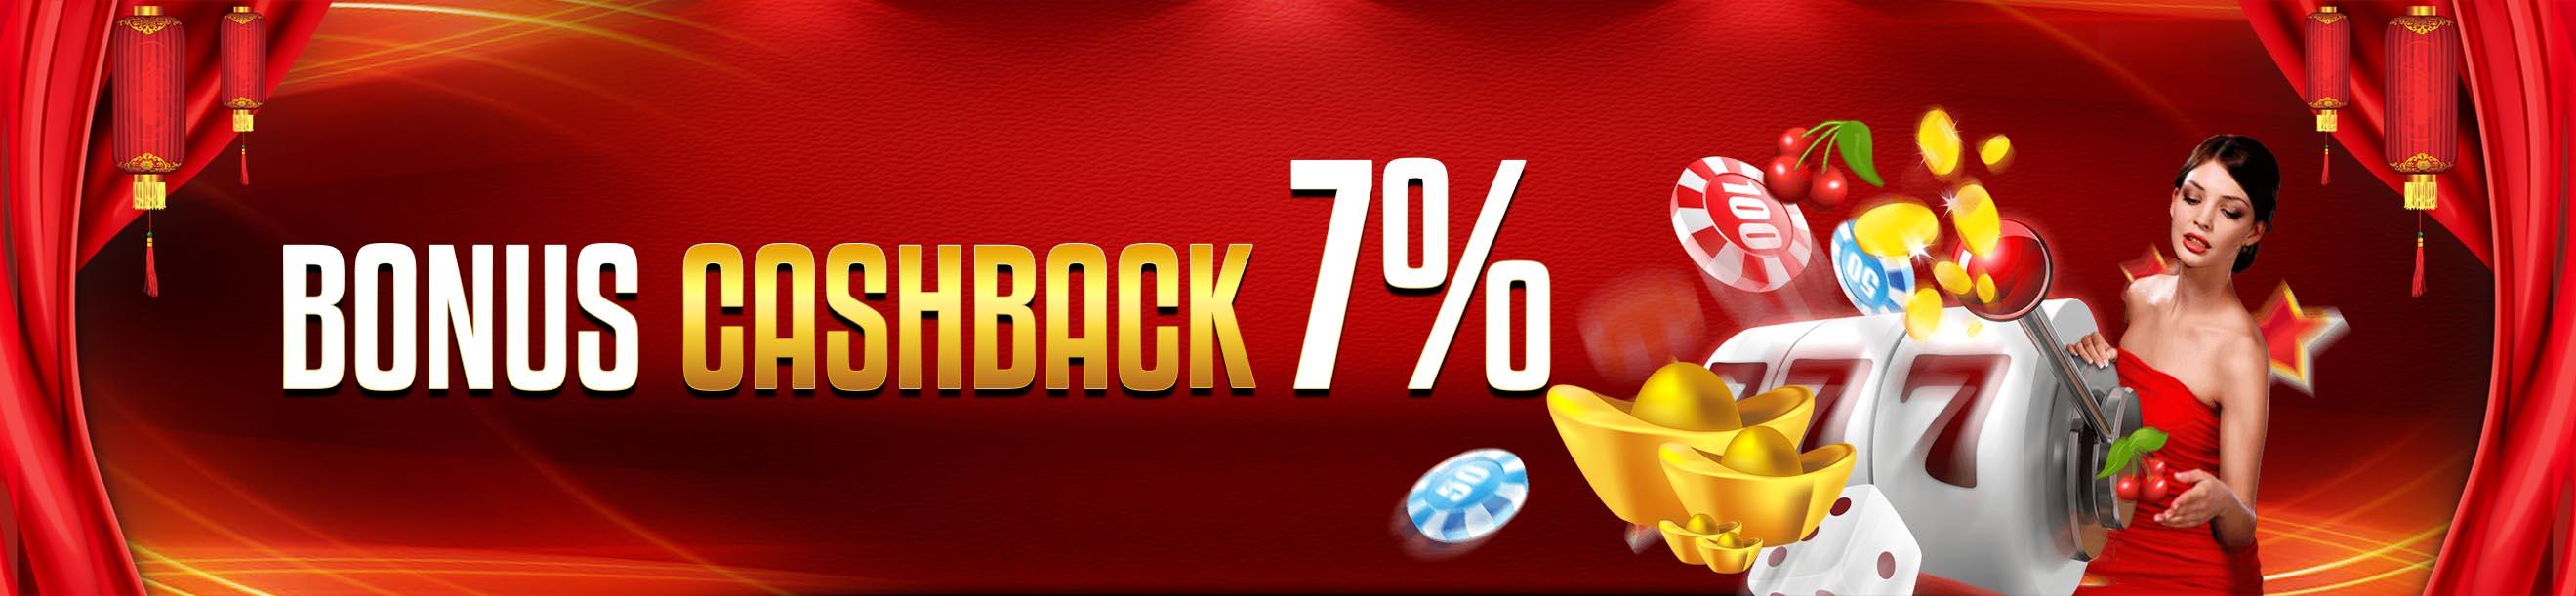 BONUS CASHBACK MINGGUAN 7%